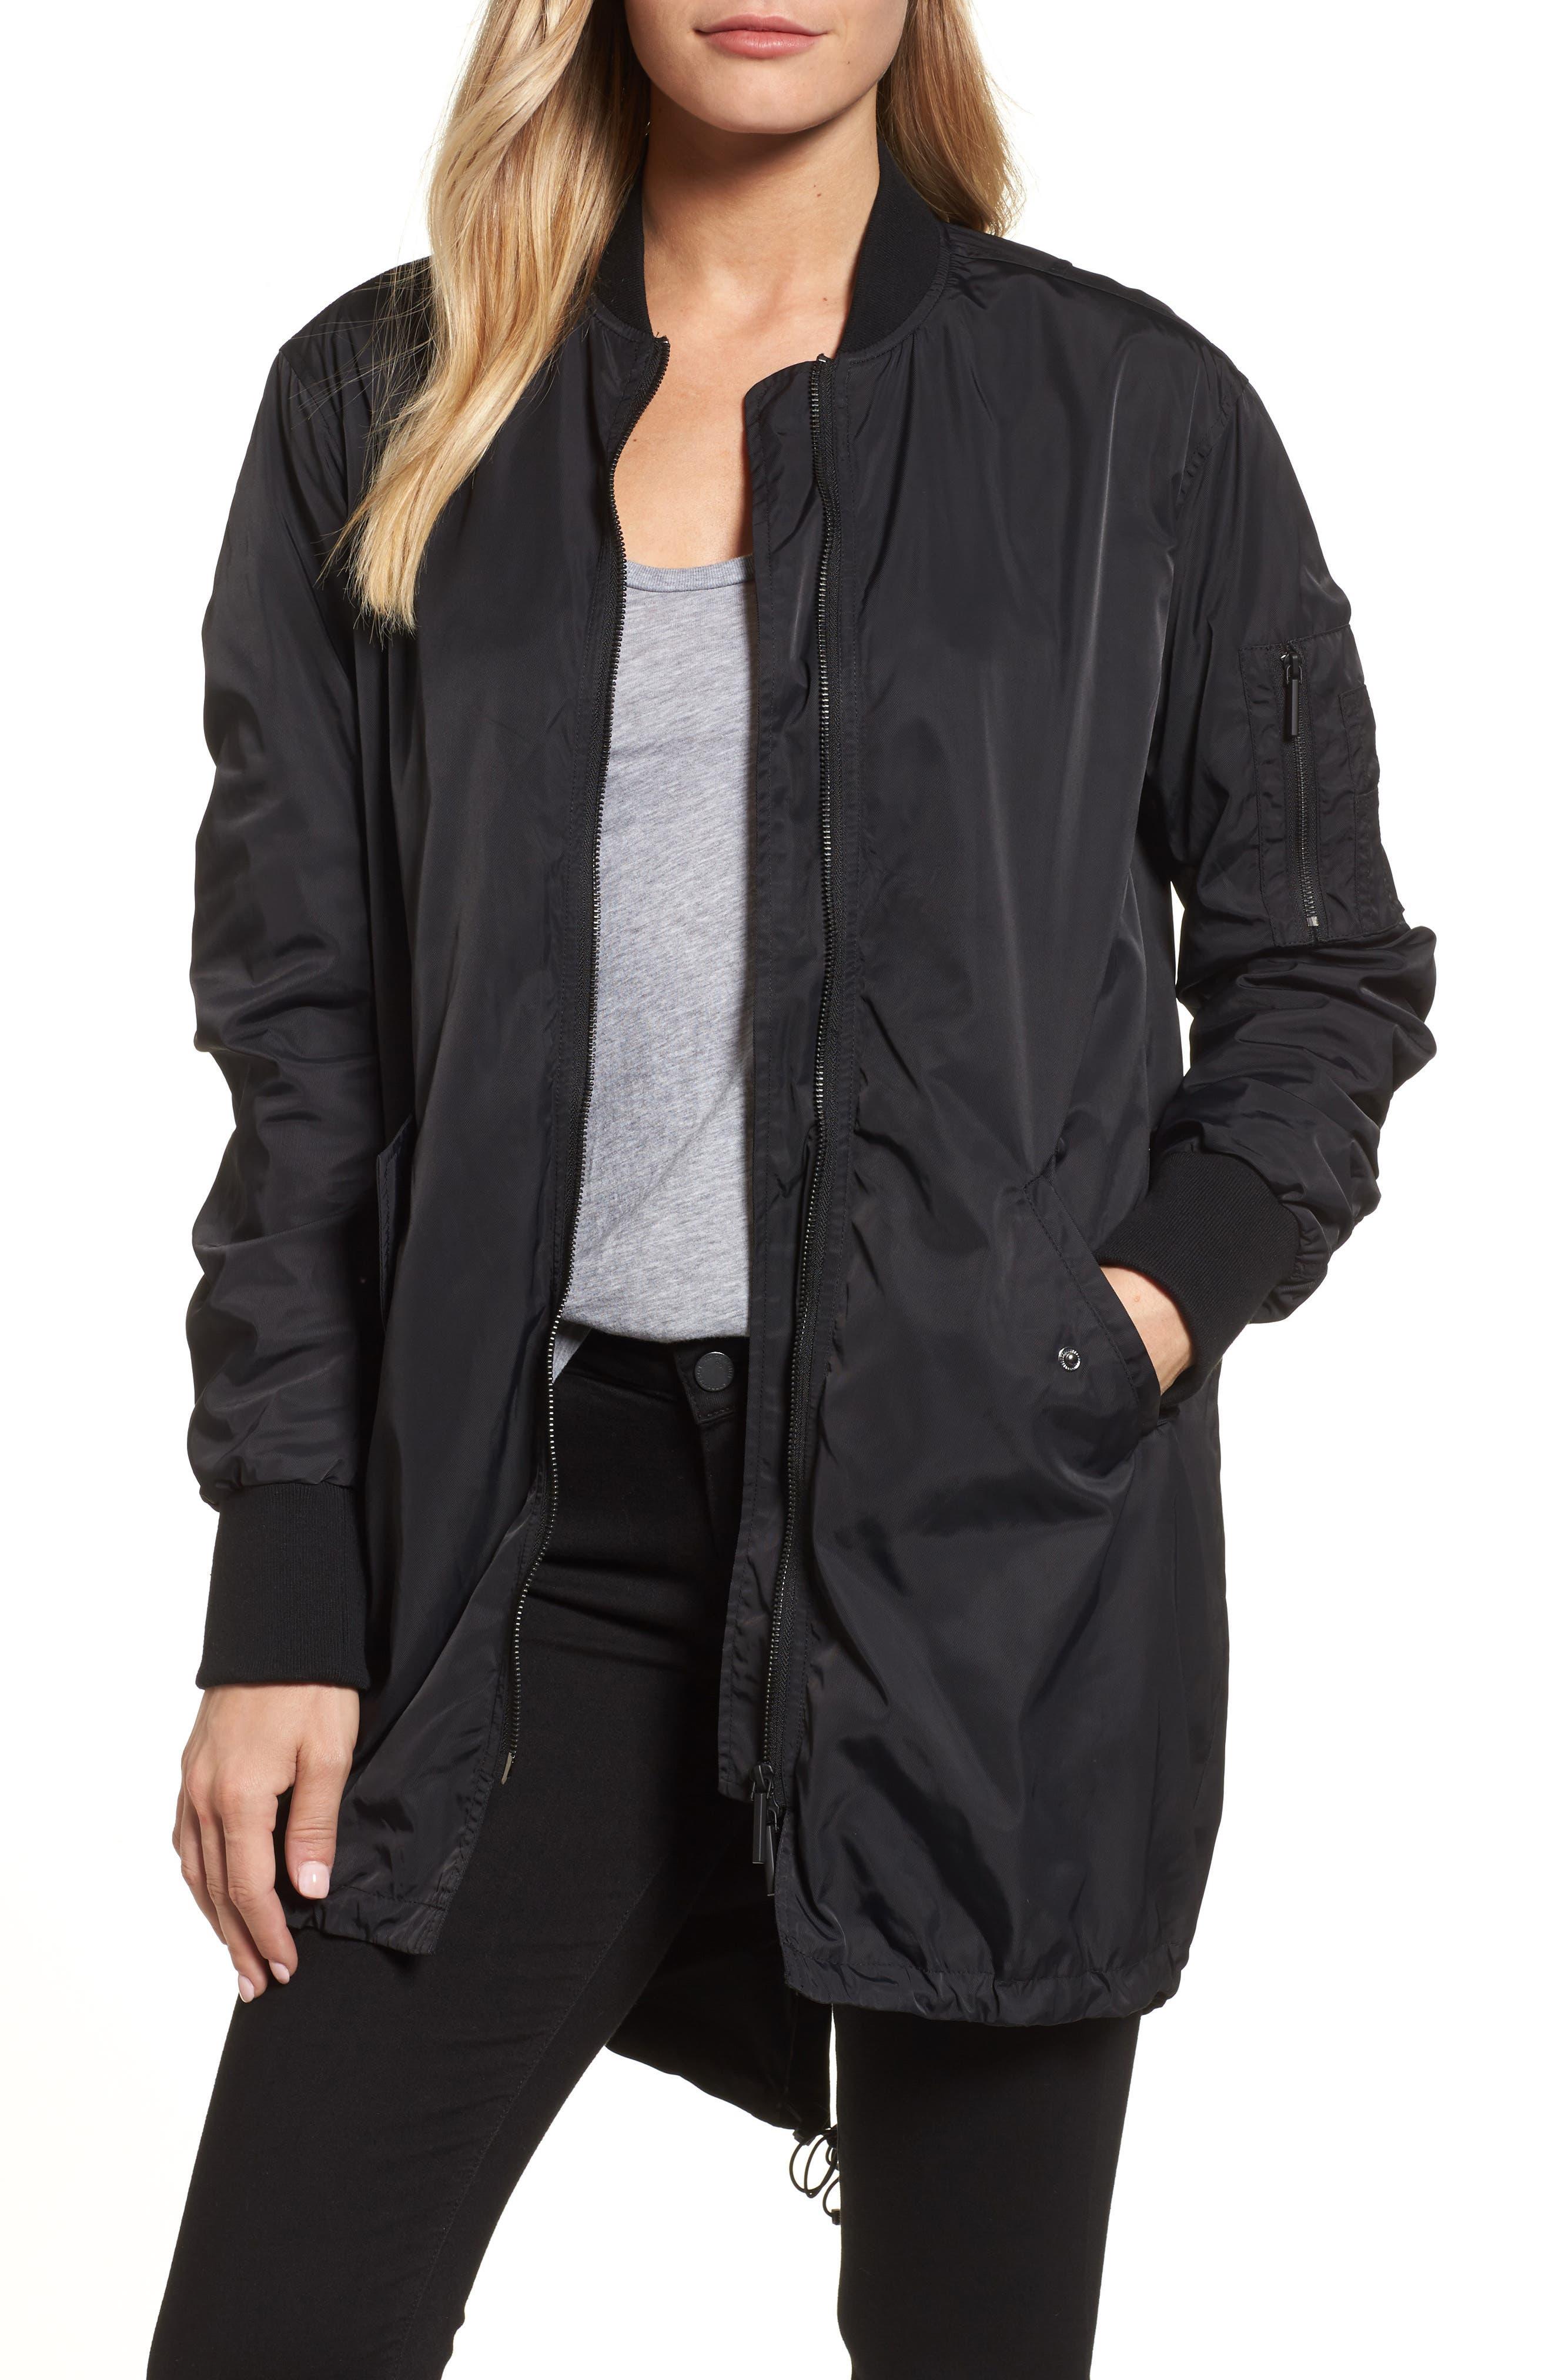 Bomber Anorak Jacket,                         Main,                         color, Black